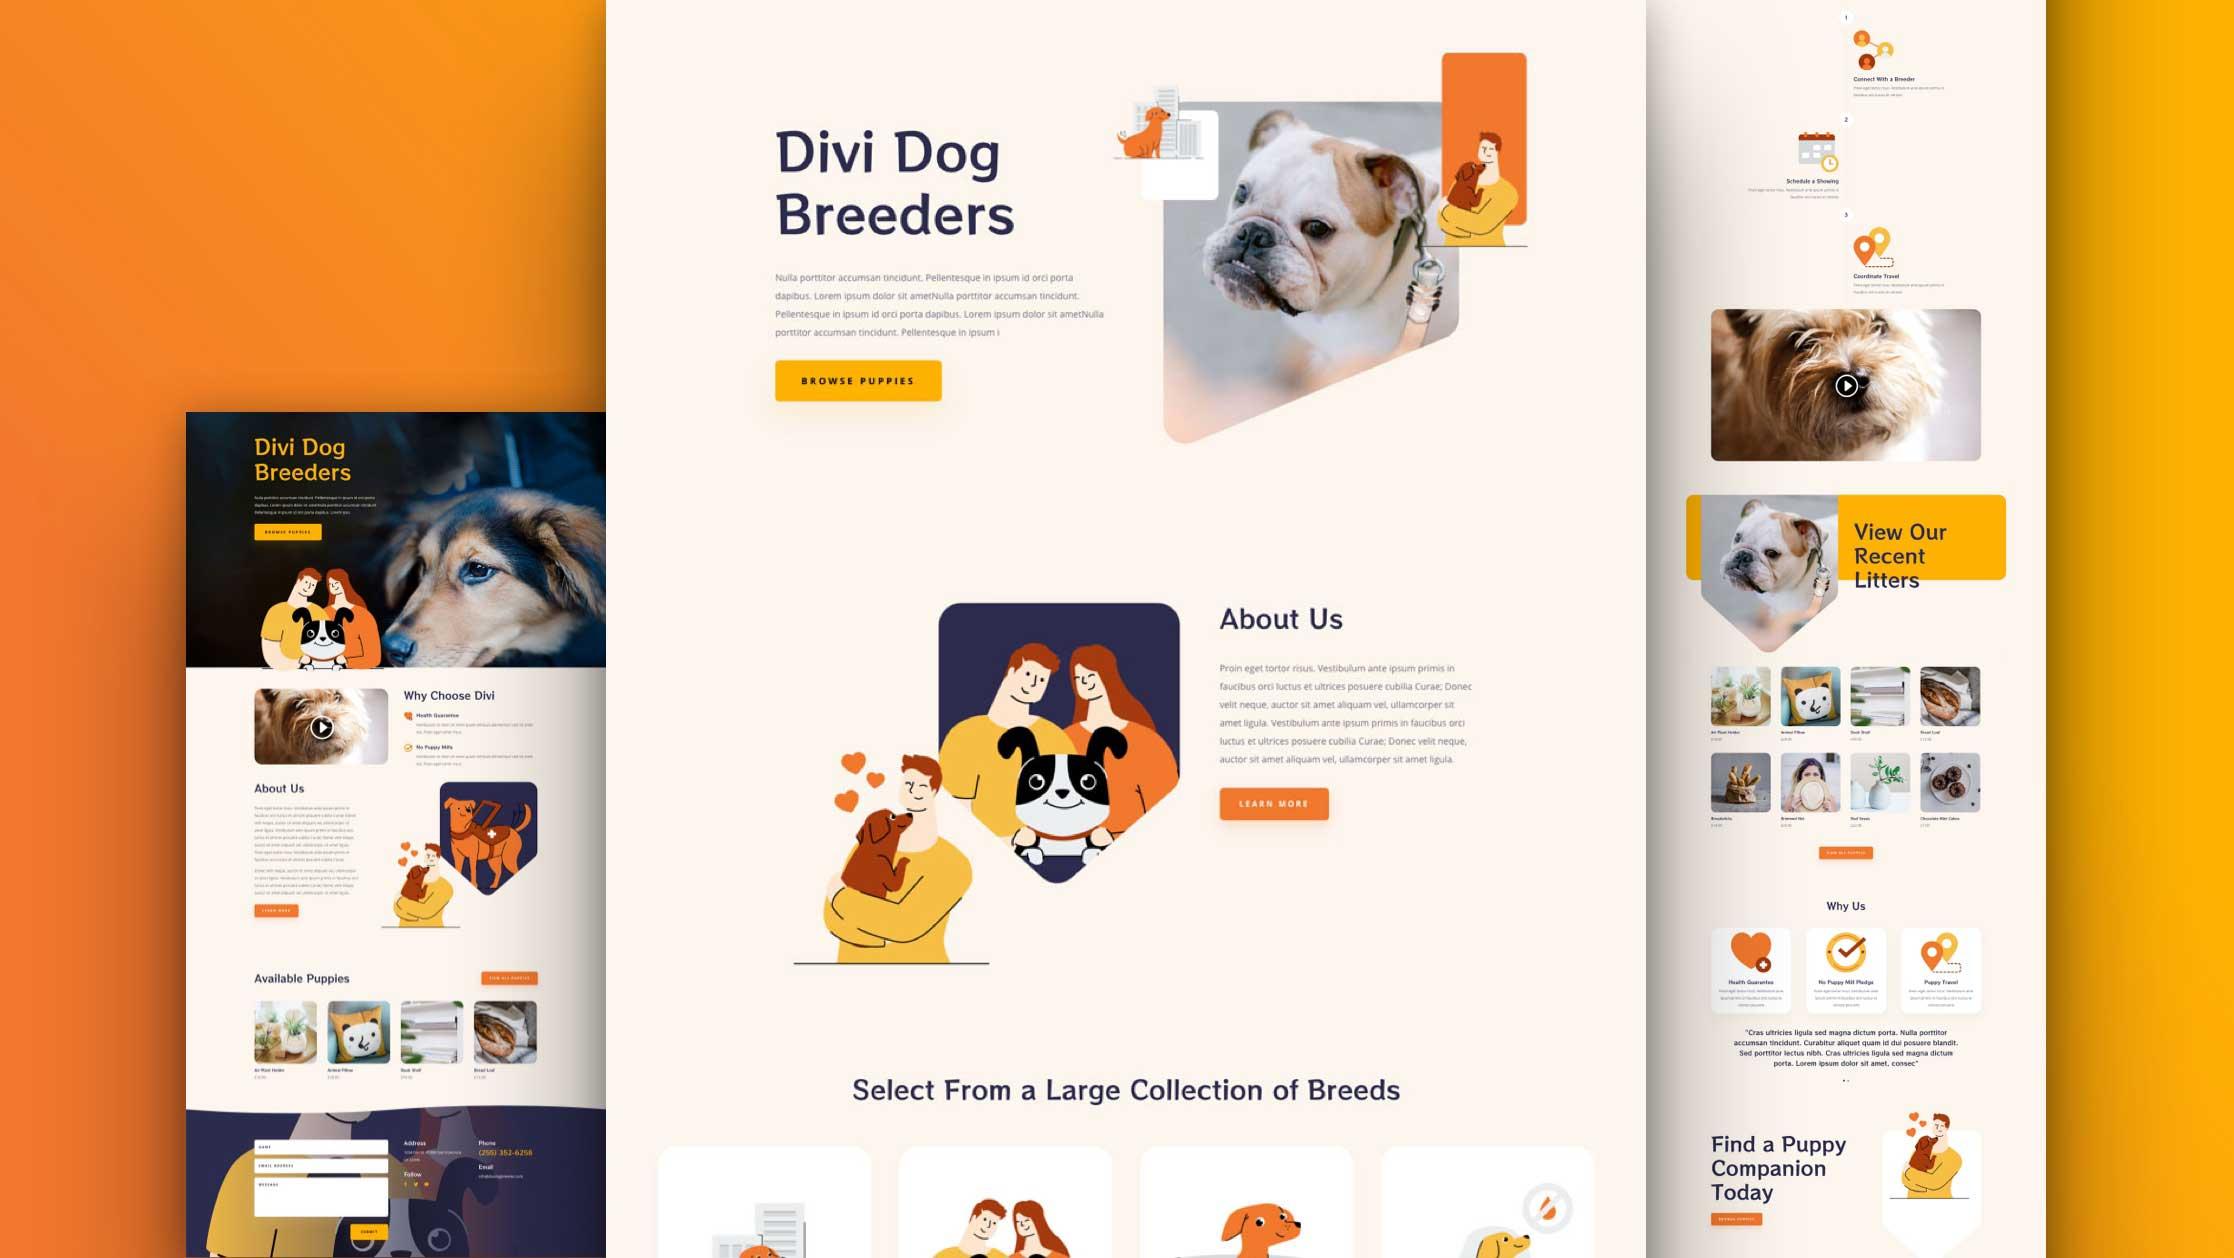 Get a FREE Dog Breeder Layout Pack for Divi